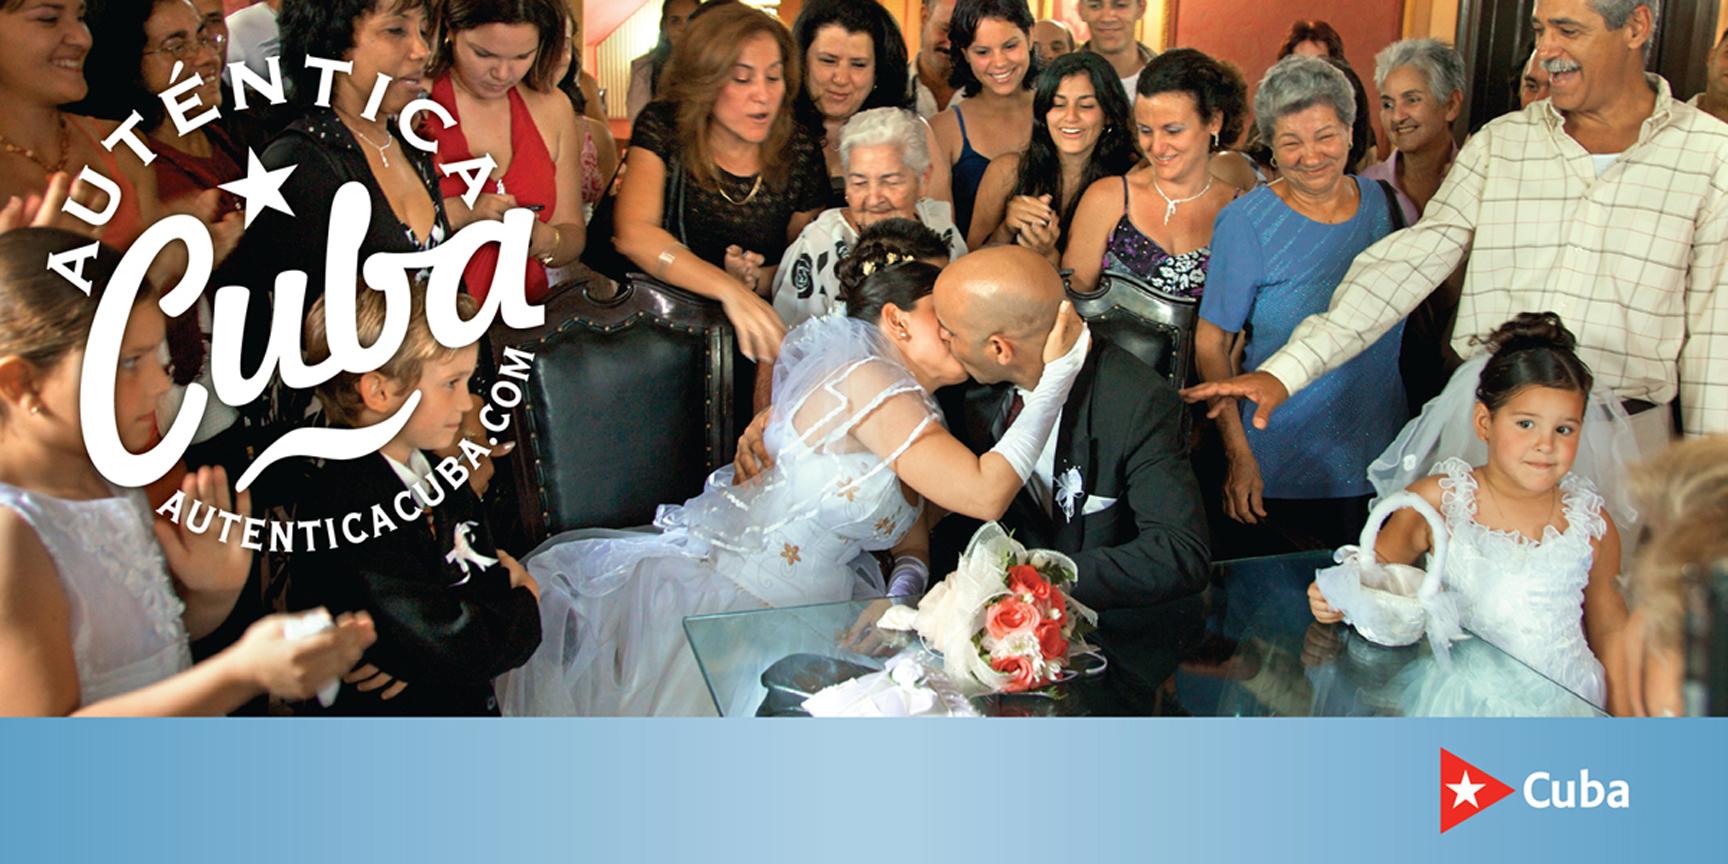 CUBA wedding.jpg